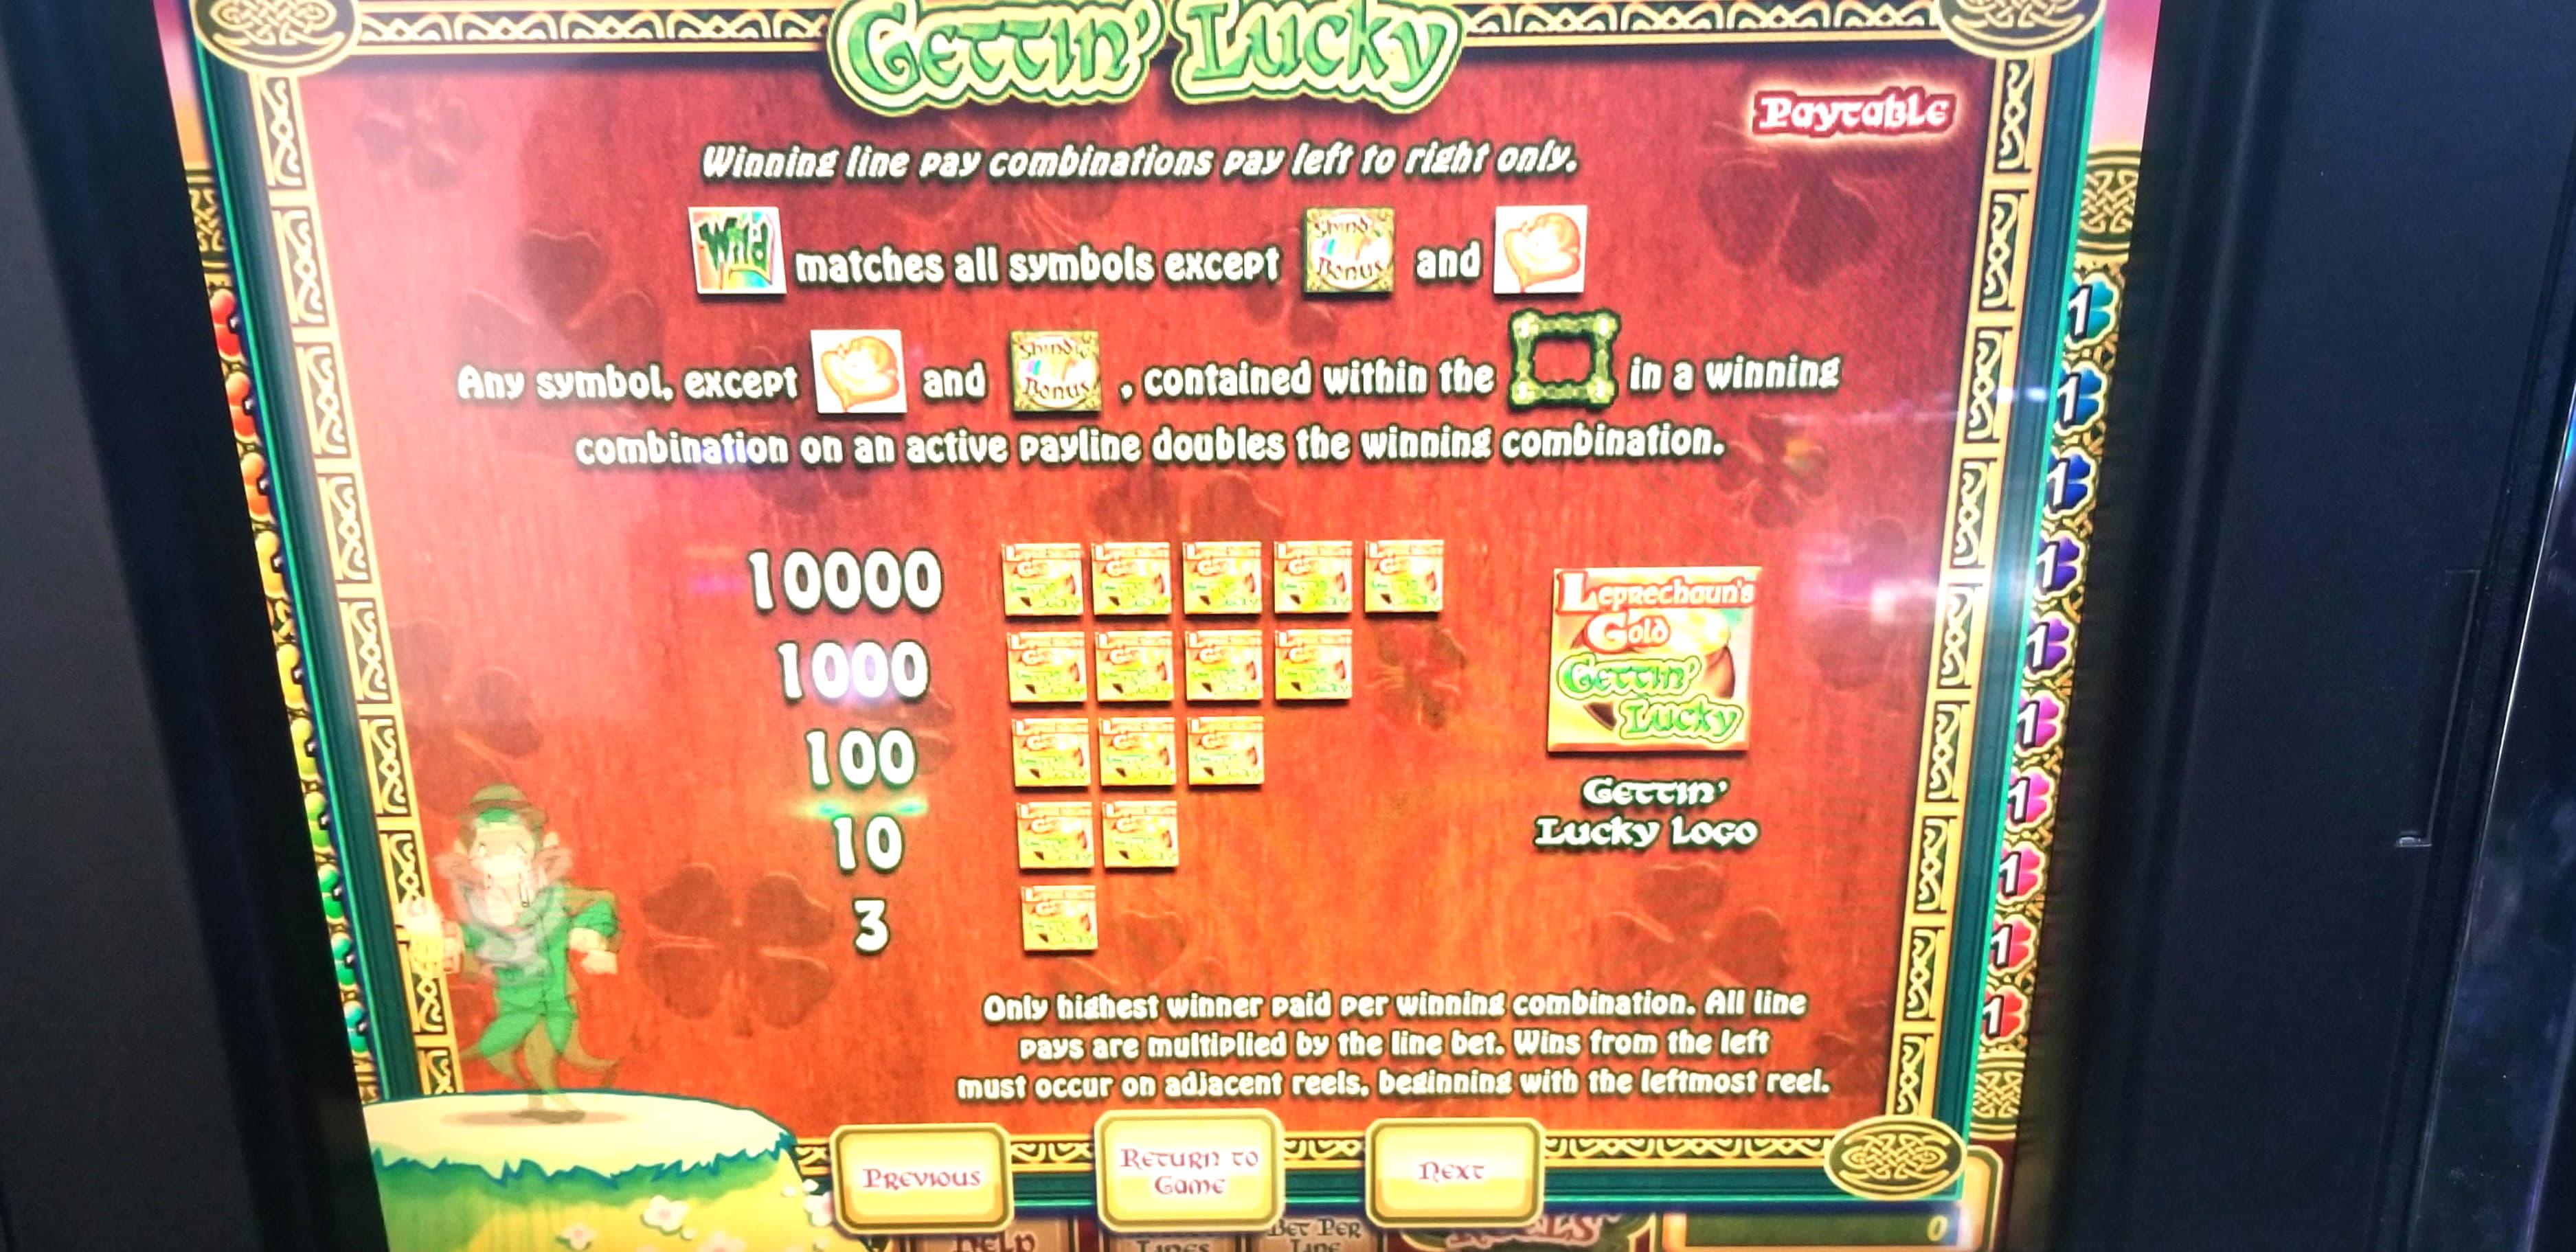 $999 Tournament at Treasure Island Jackpots Casino (Australia Casino Mirror)